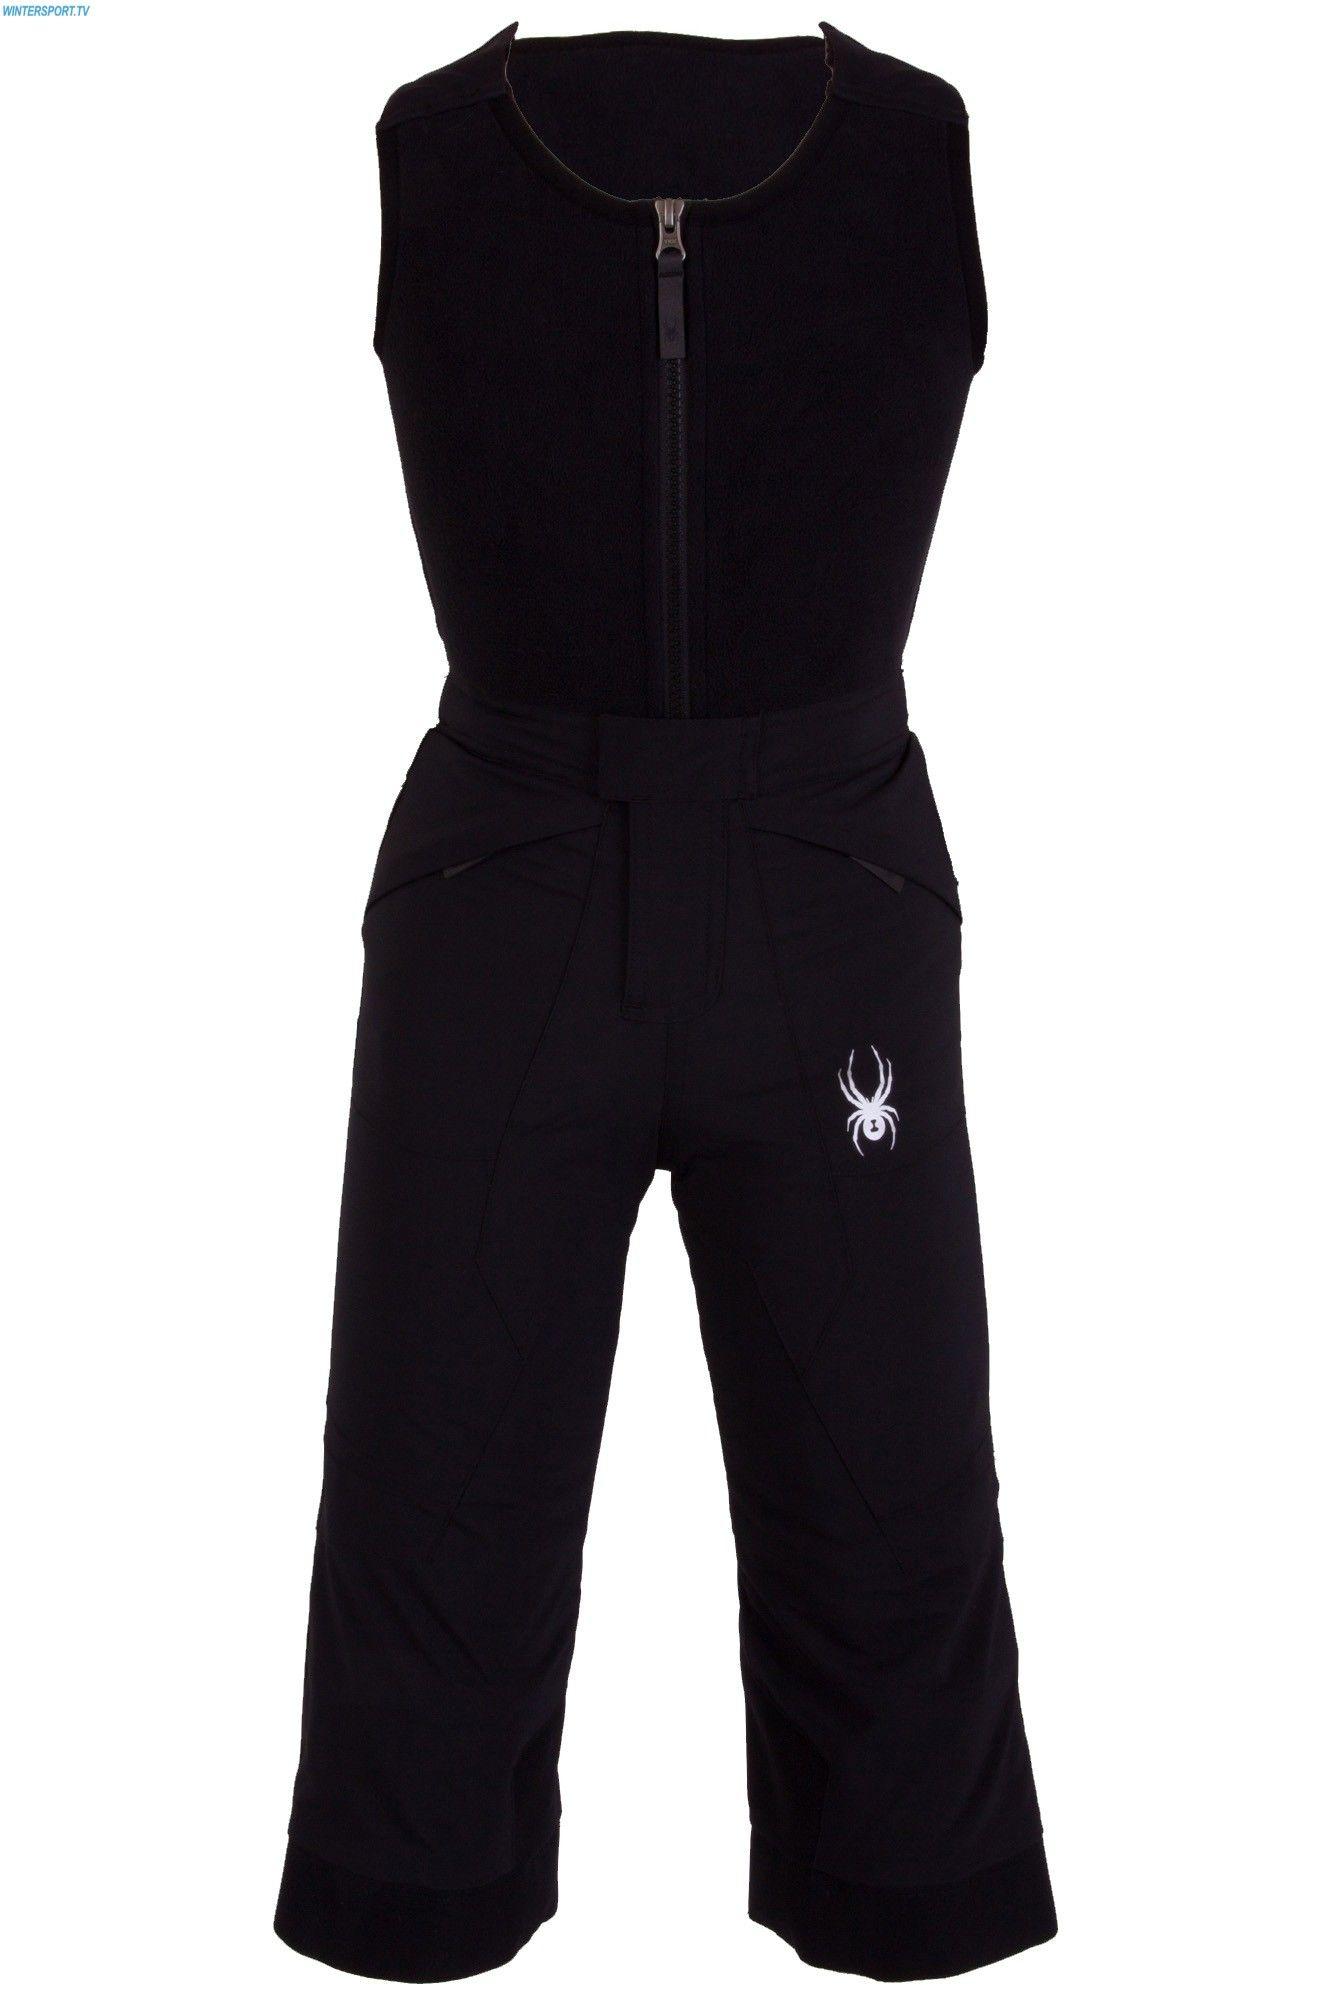 8239974b0 Spyder Mini Expedition Pant - Black | Spyder Kids Ski Wear | Black ...